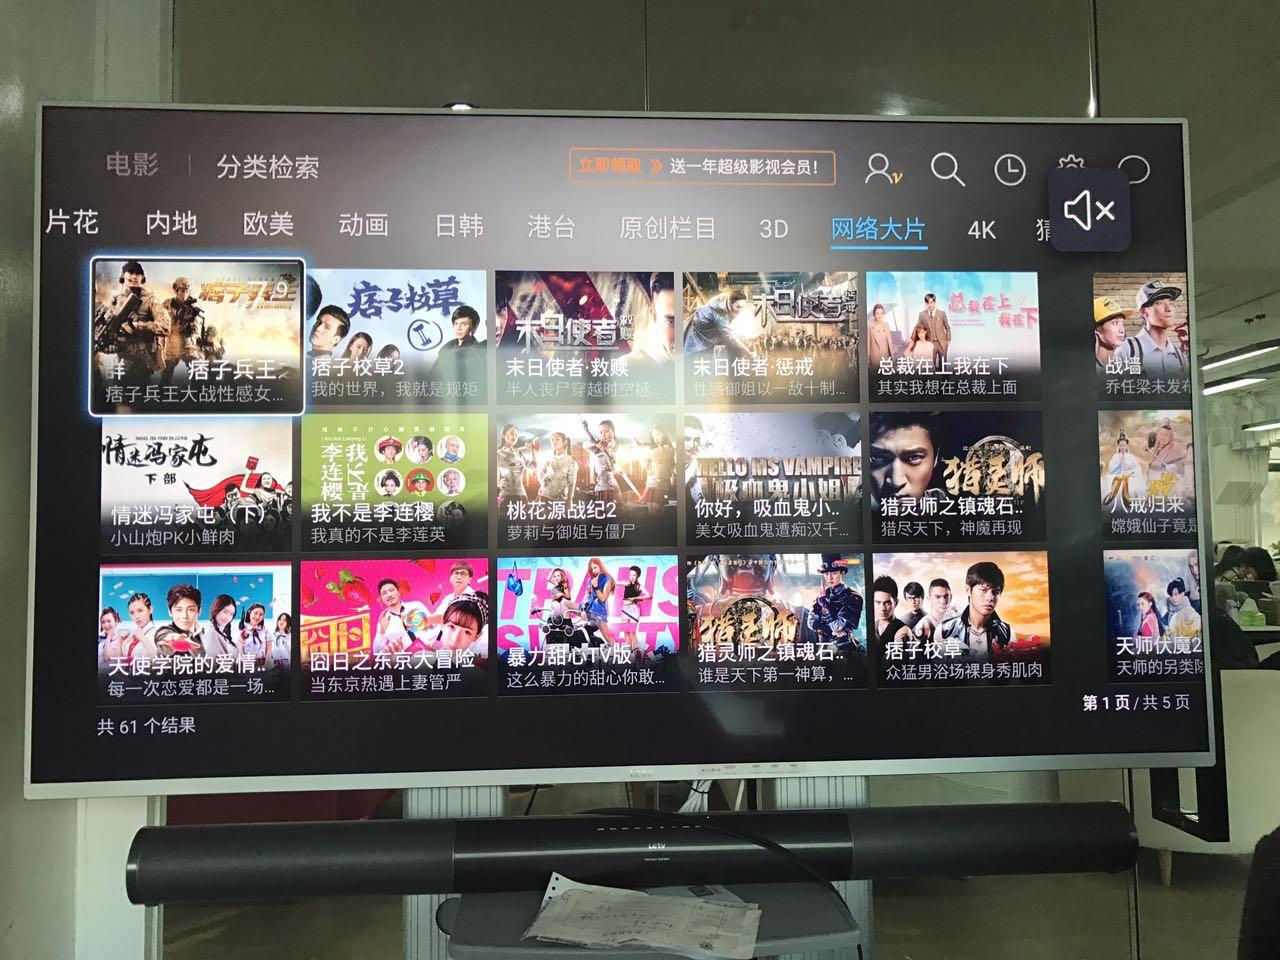 TV端-电影频道网络大片推荐